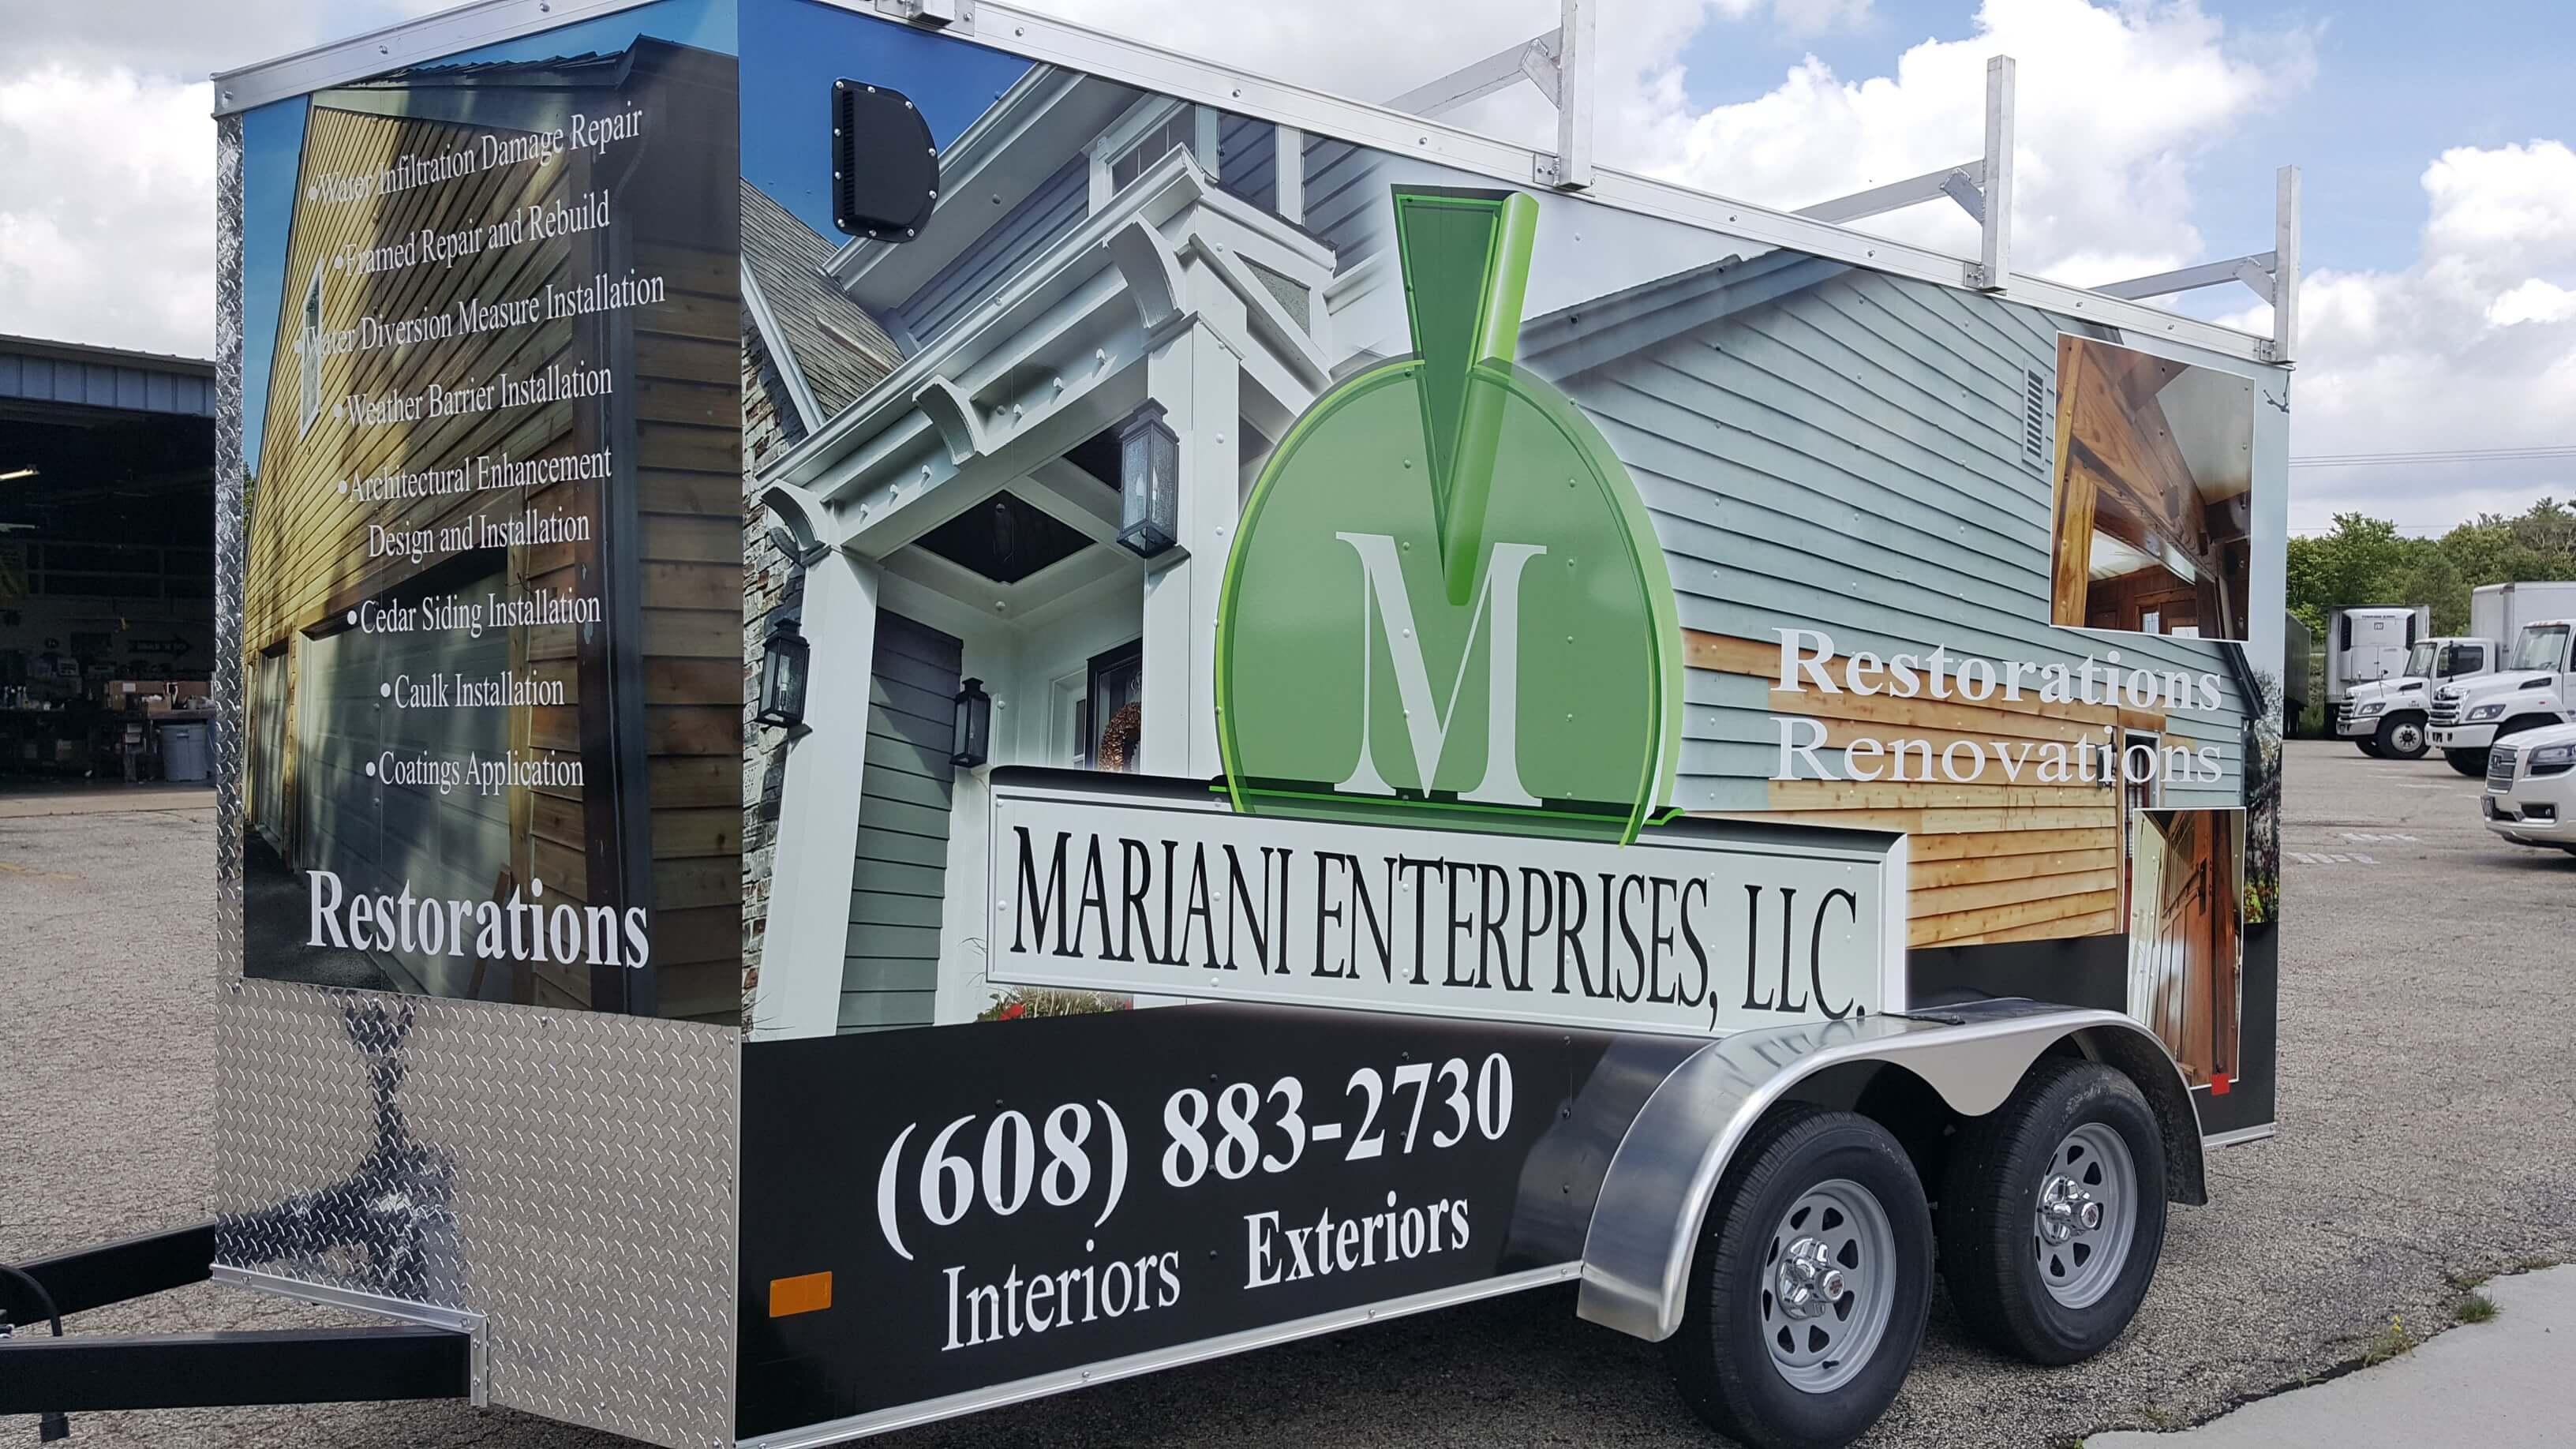 Enterprise Mariani Trailer Full Wrap